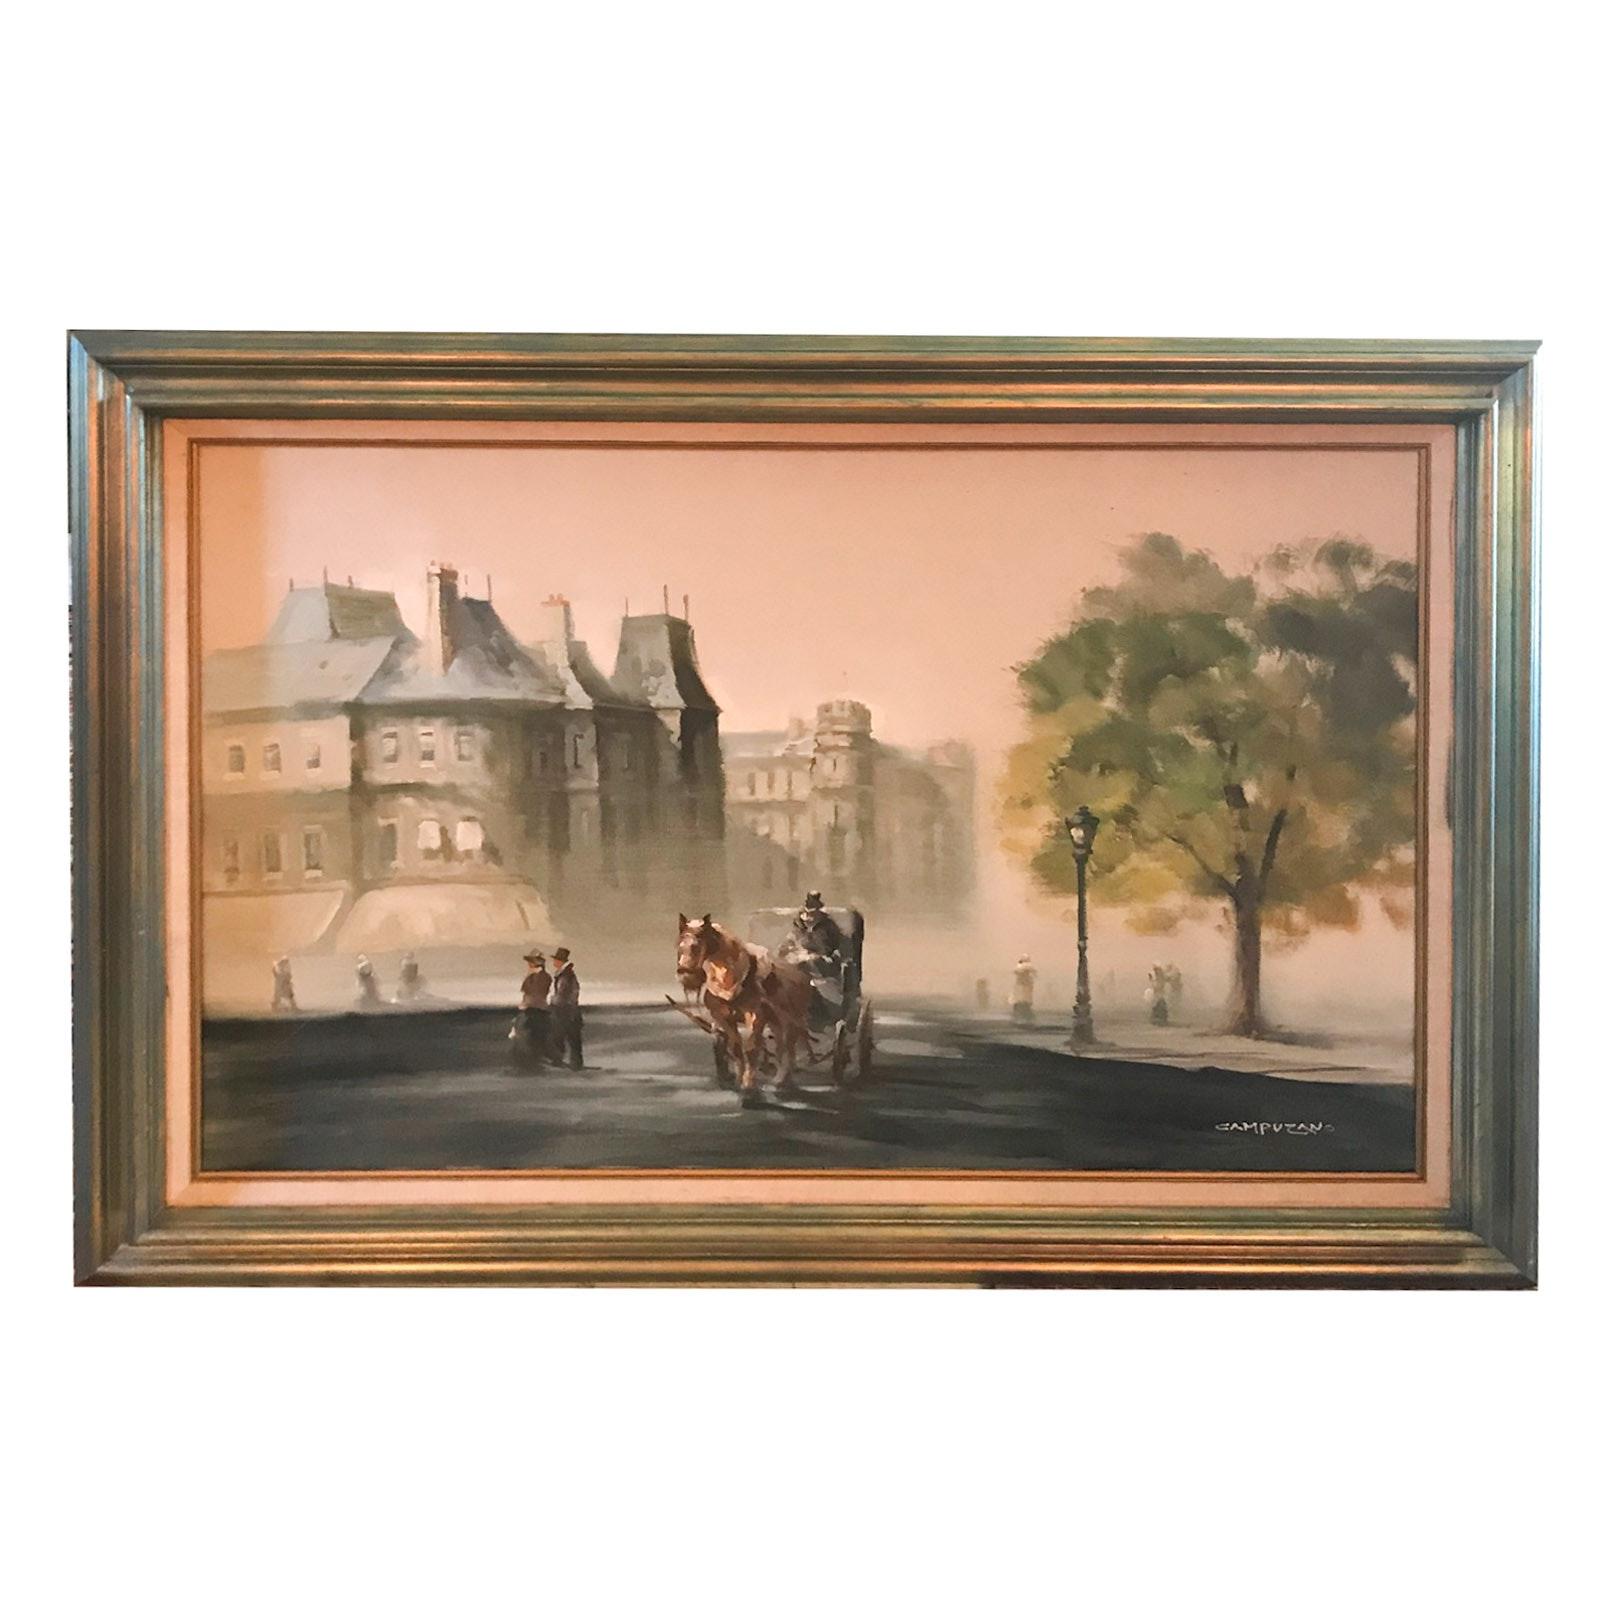 Jose Luis Campuzano Oil Painting of Street Scene